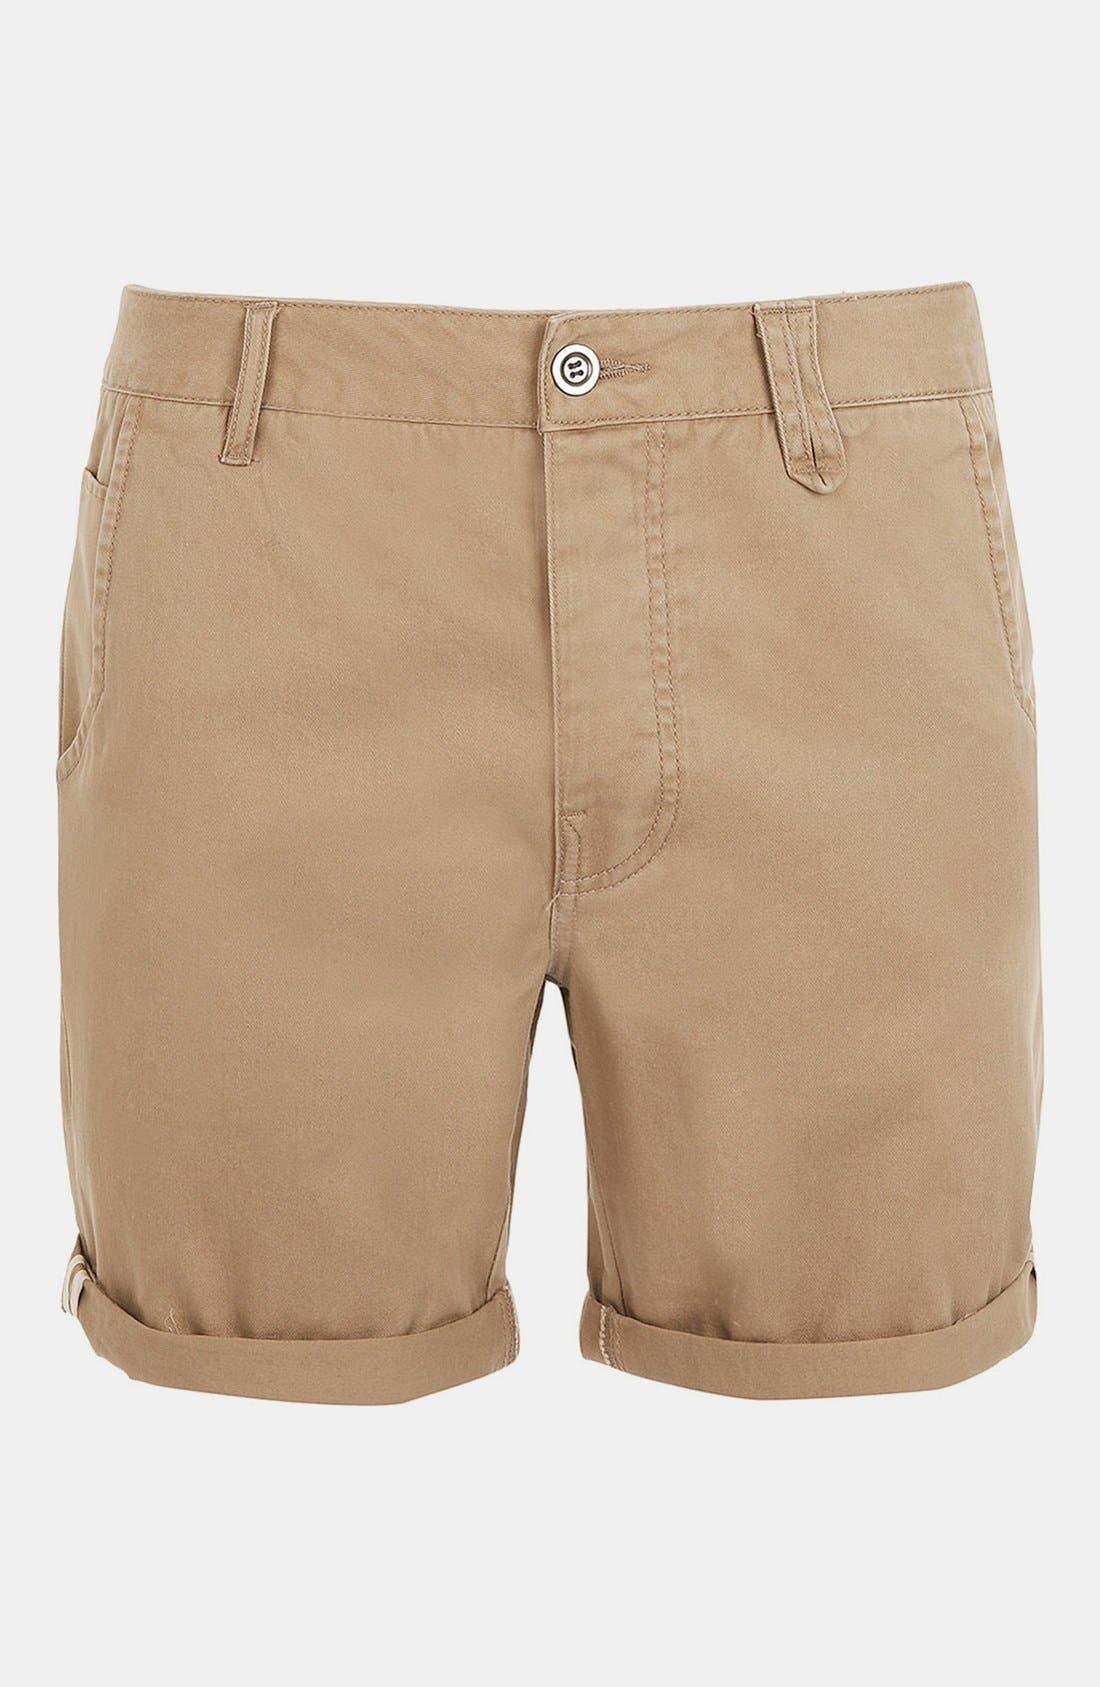 Alternate Image 1 Selected - Topman Chino Shorts